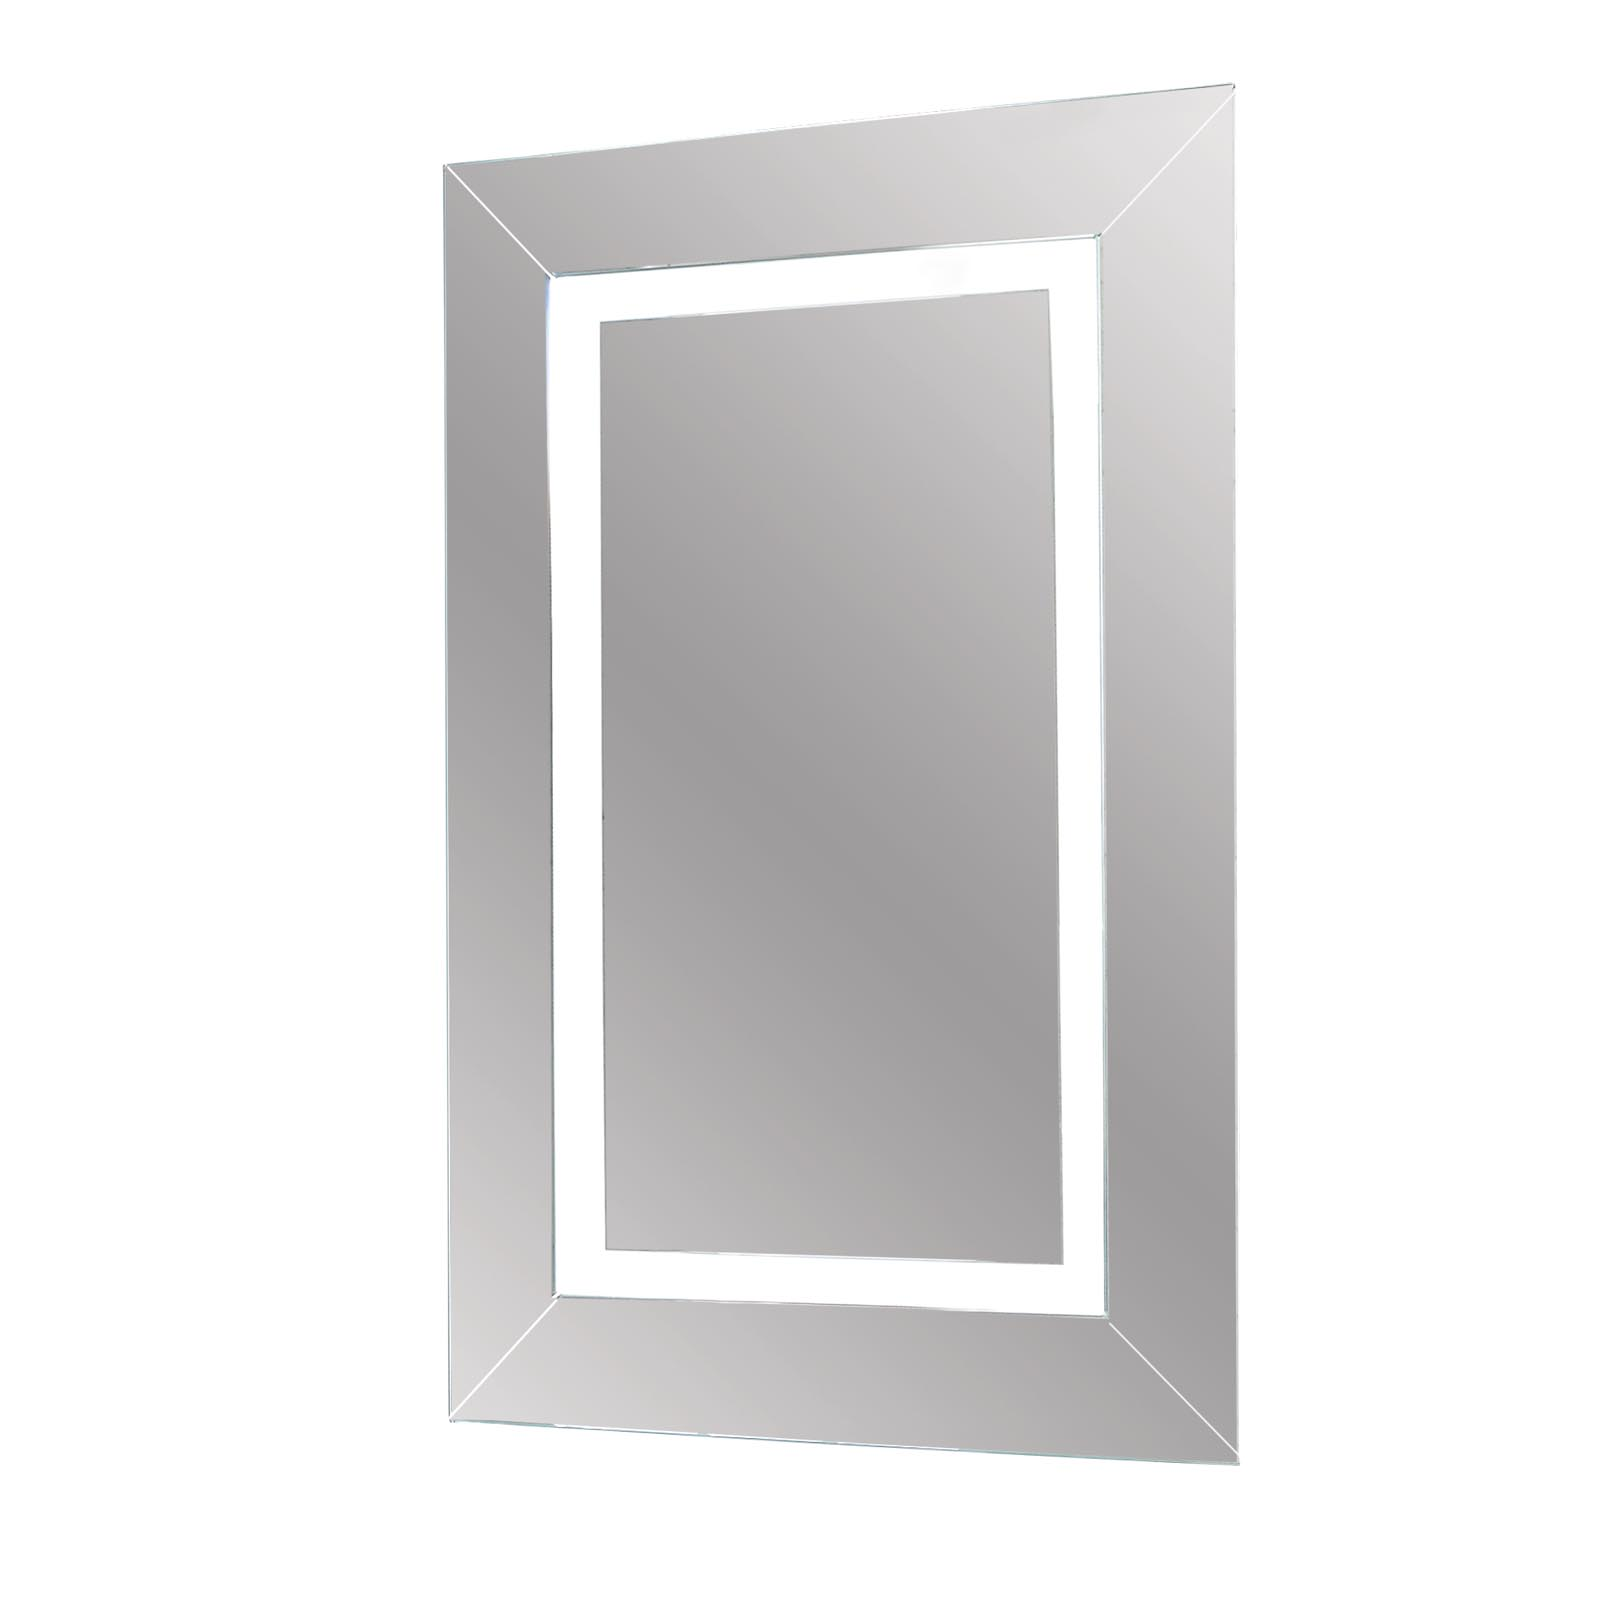 Heated Bathroom Mirrors With Lights: Phoenix Lunar Heated Bathroom Mirror With Lights Built In